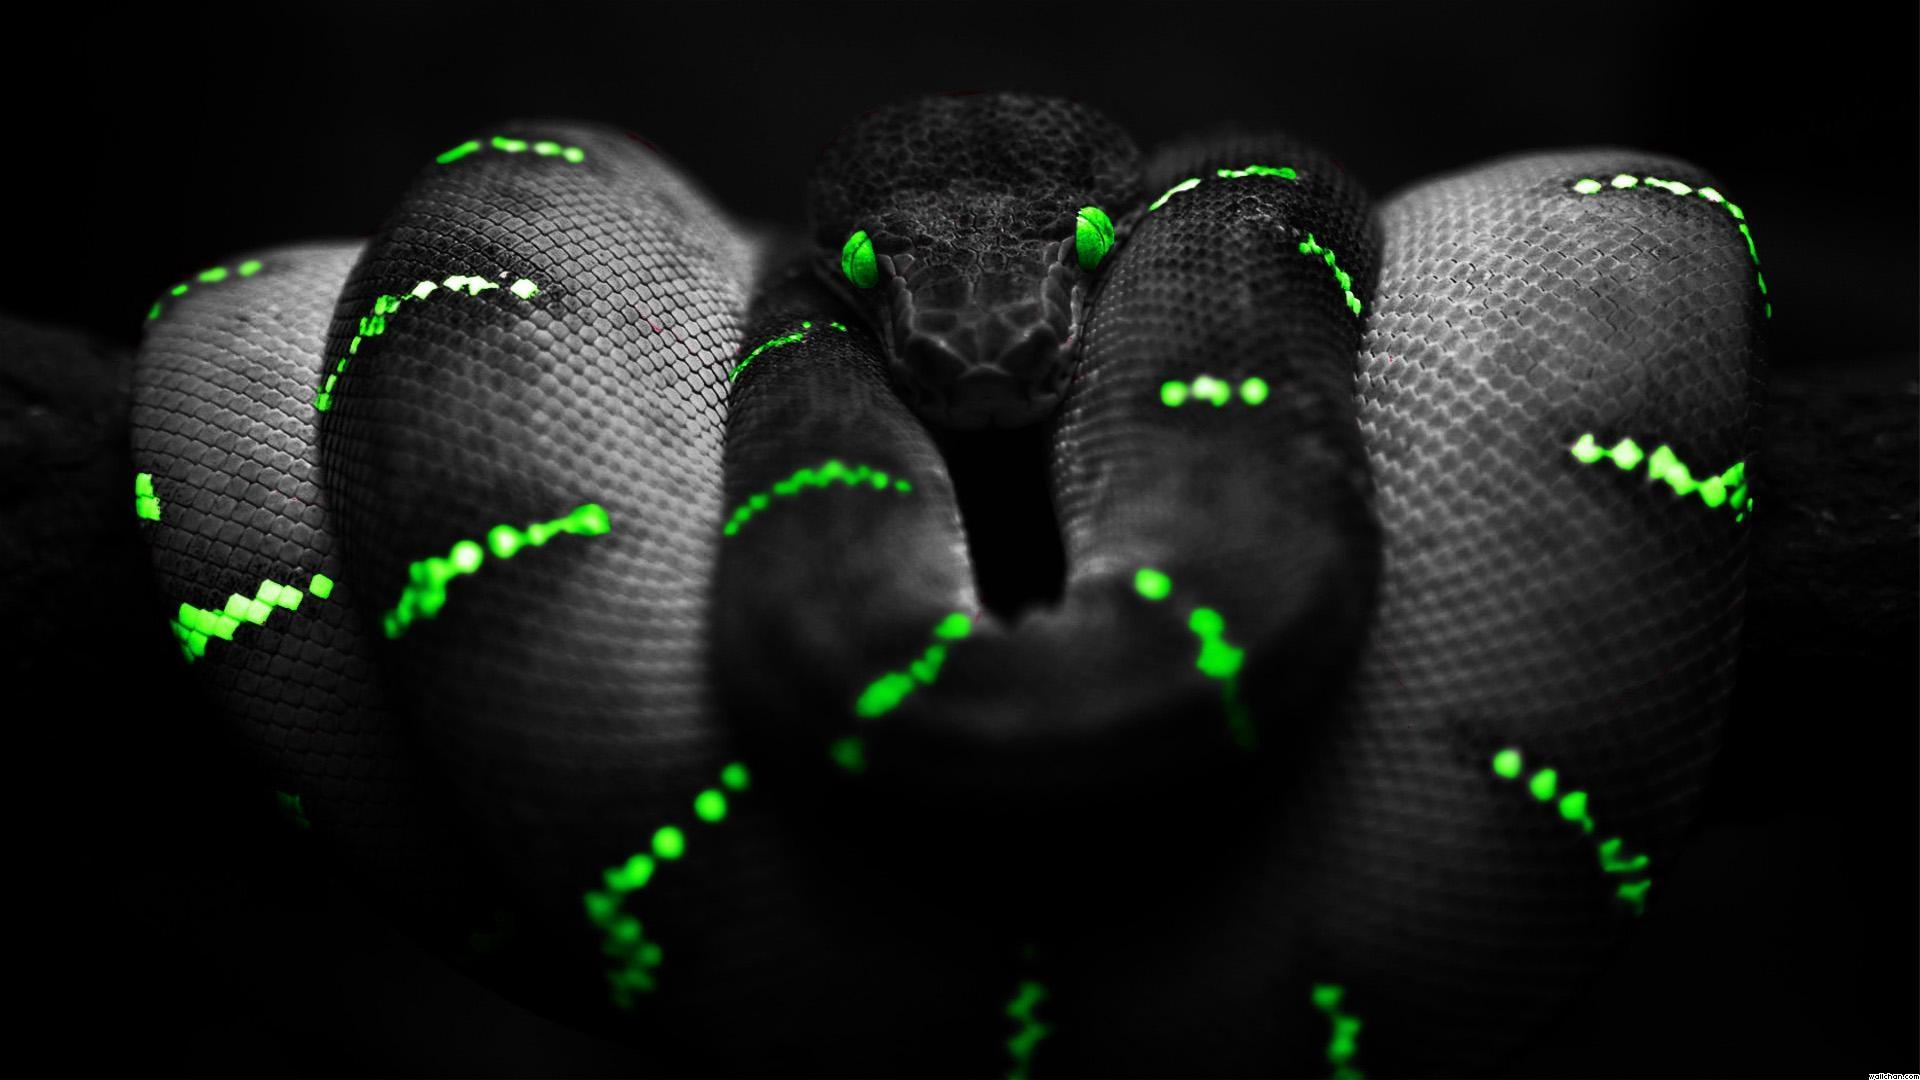 Green and black wallpapers wallpapersafari - Green snake hd wallpaper ...